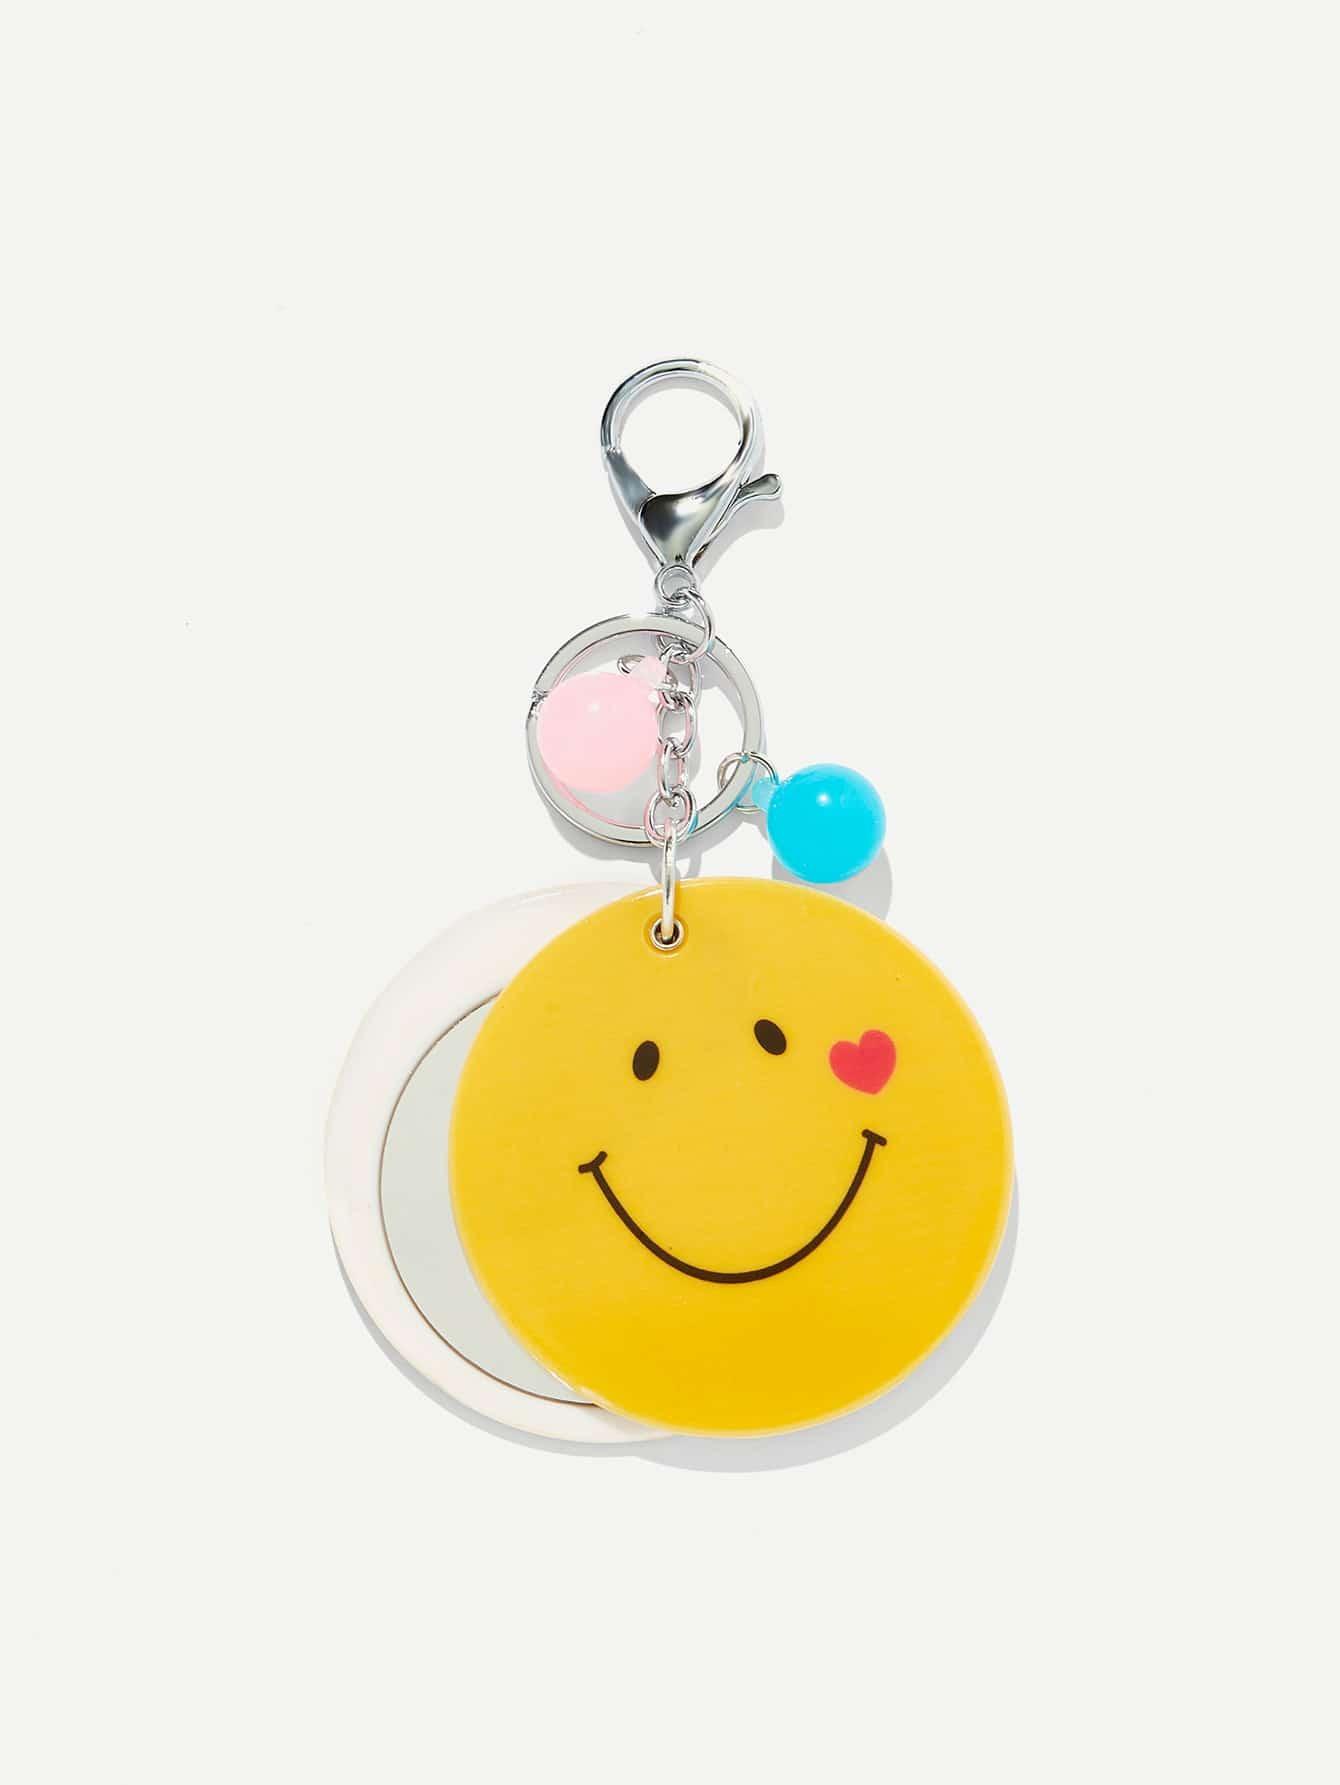 Random Color Ball Round Emoji Keychain